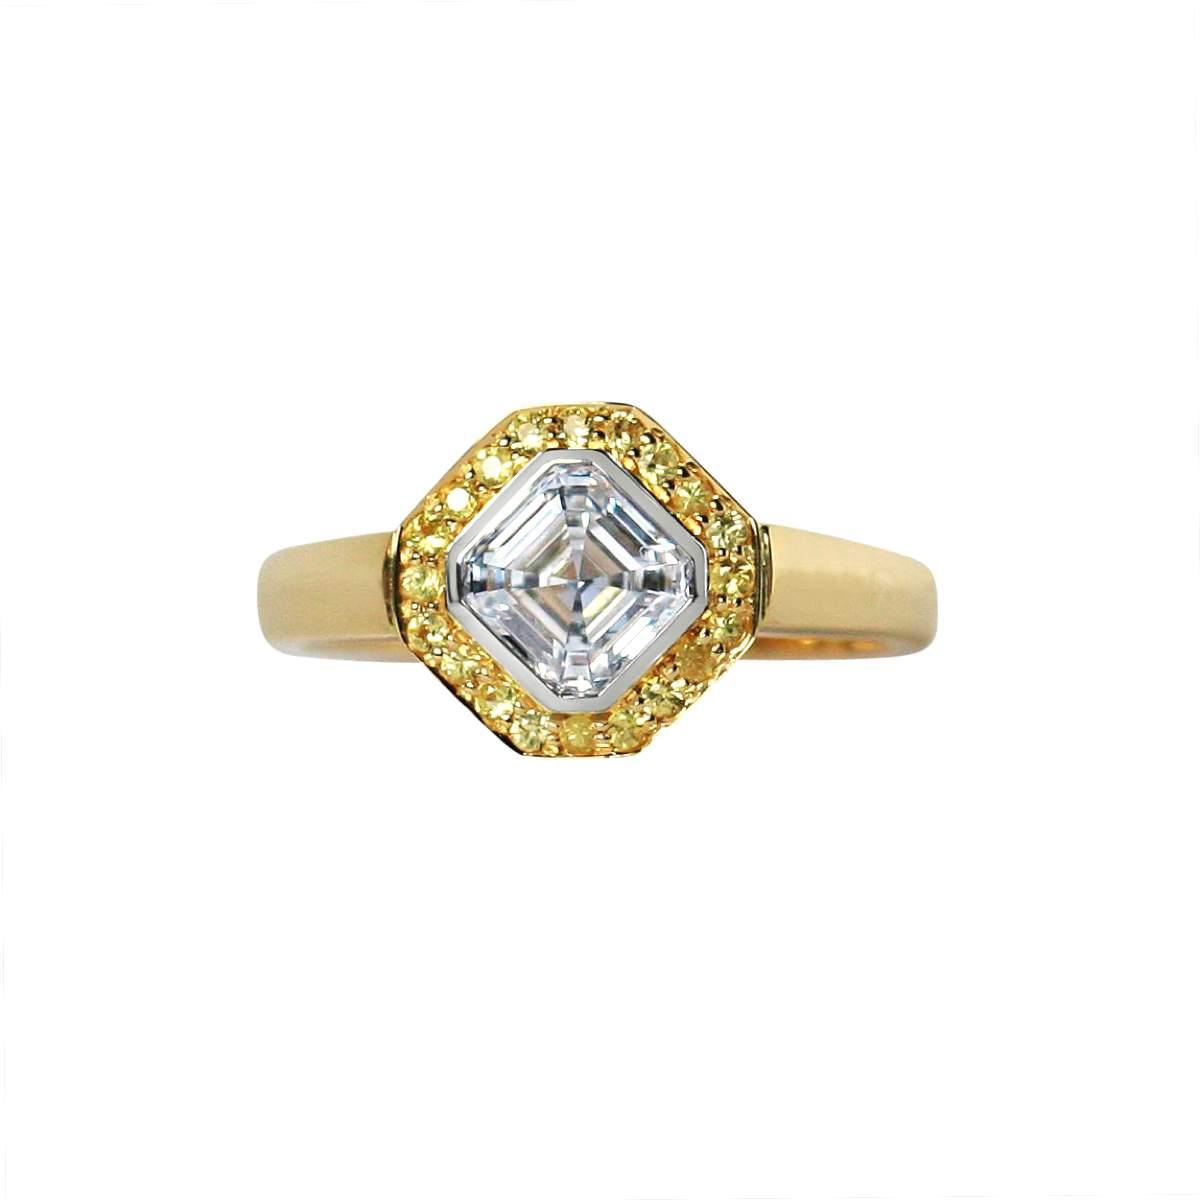 Gee Woods bespoke ring